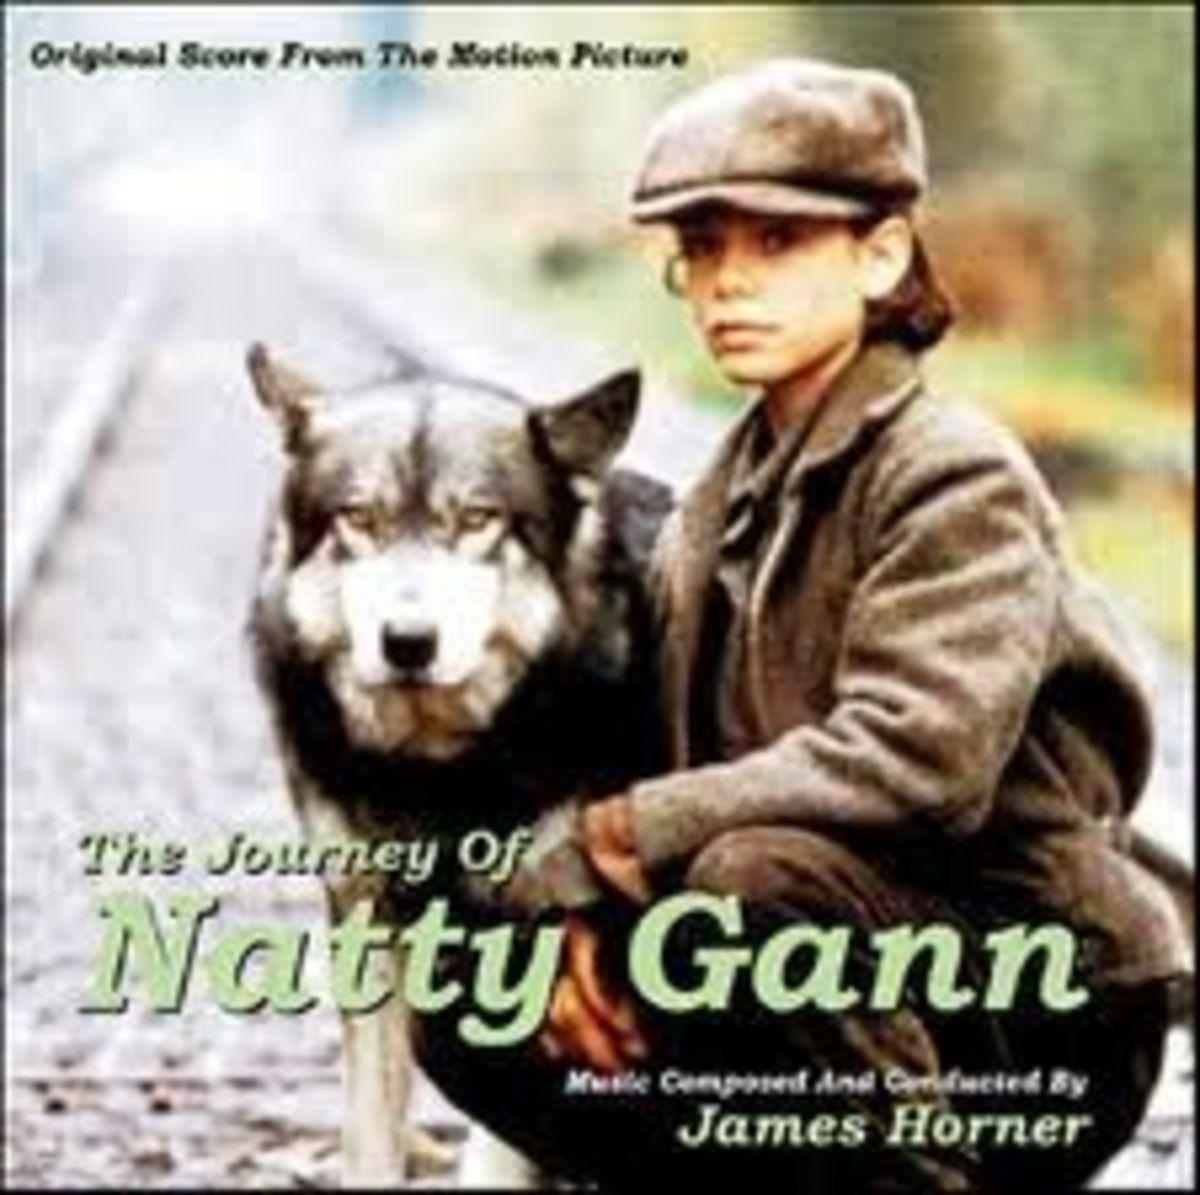 Jed & Natty (Meredith Salenger) in The Journey of Natty Gann